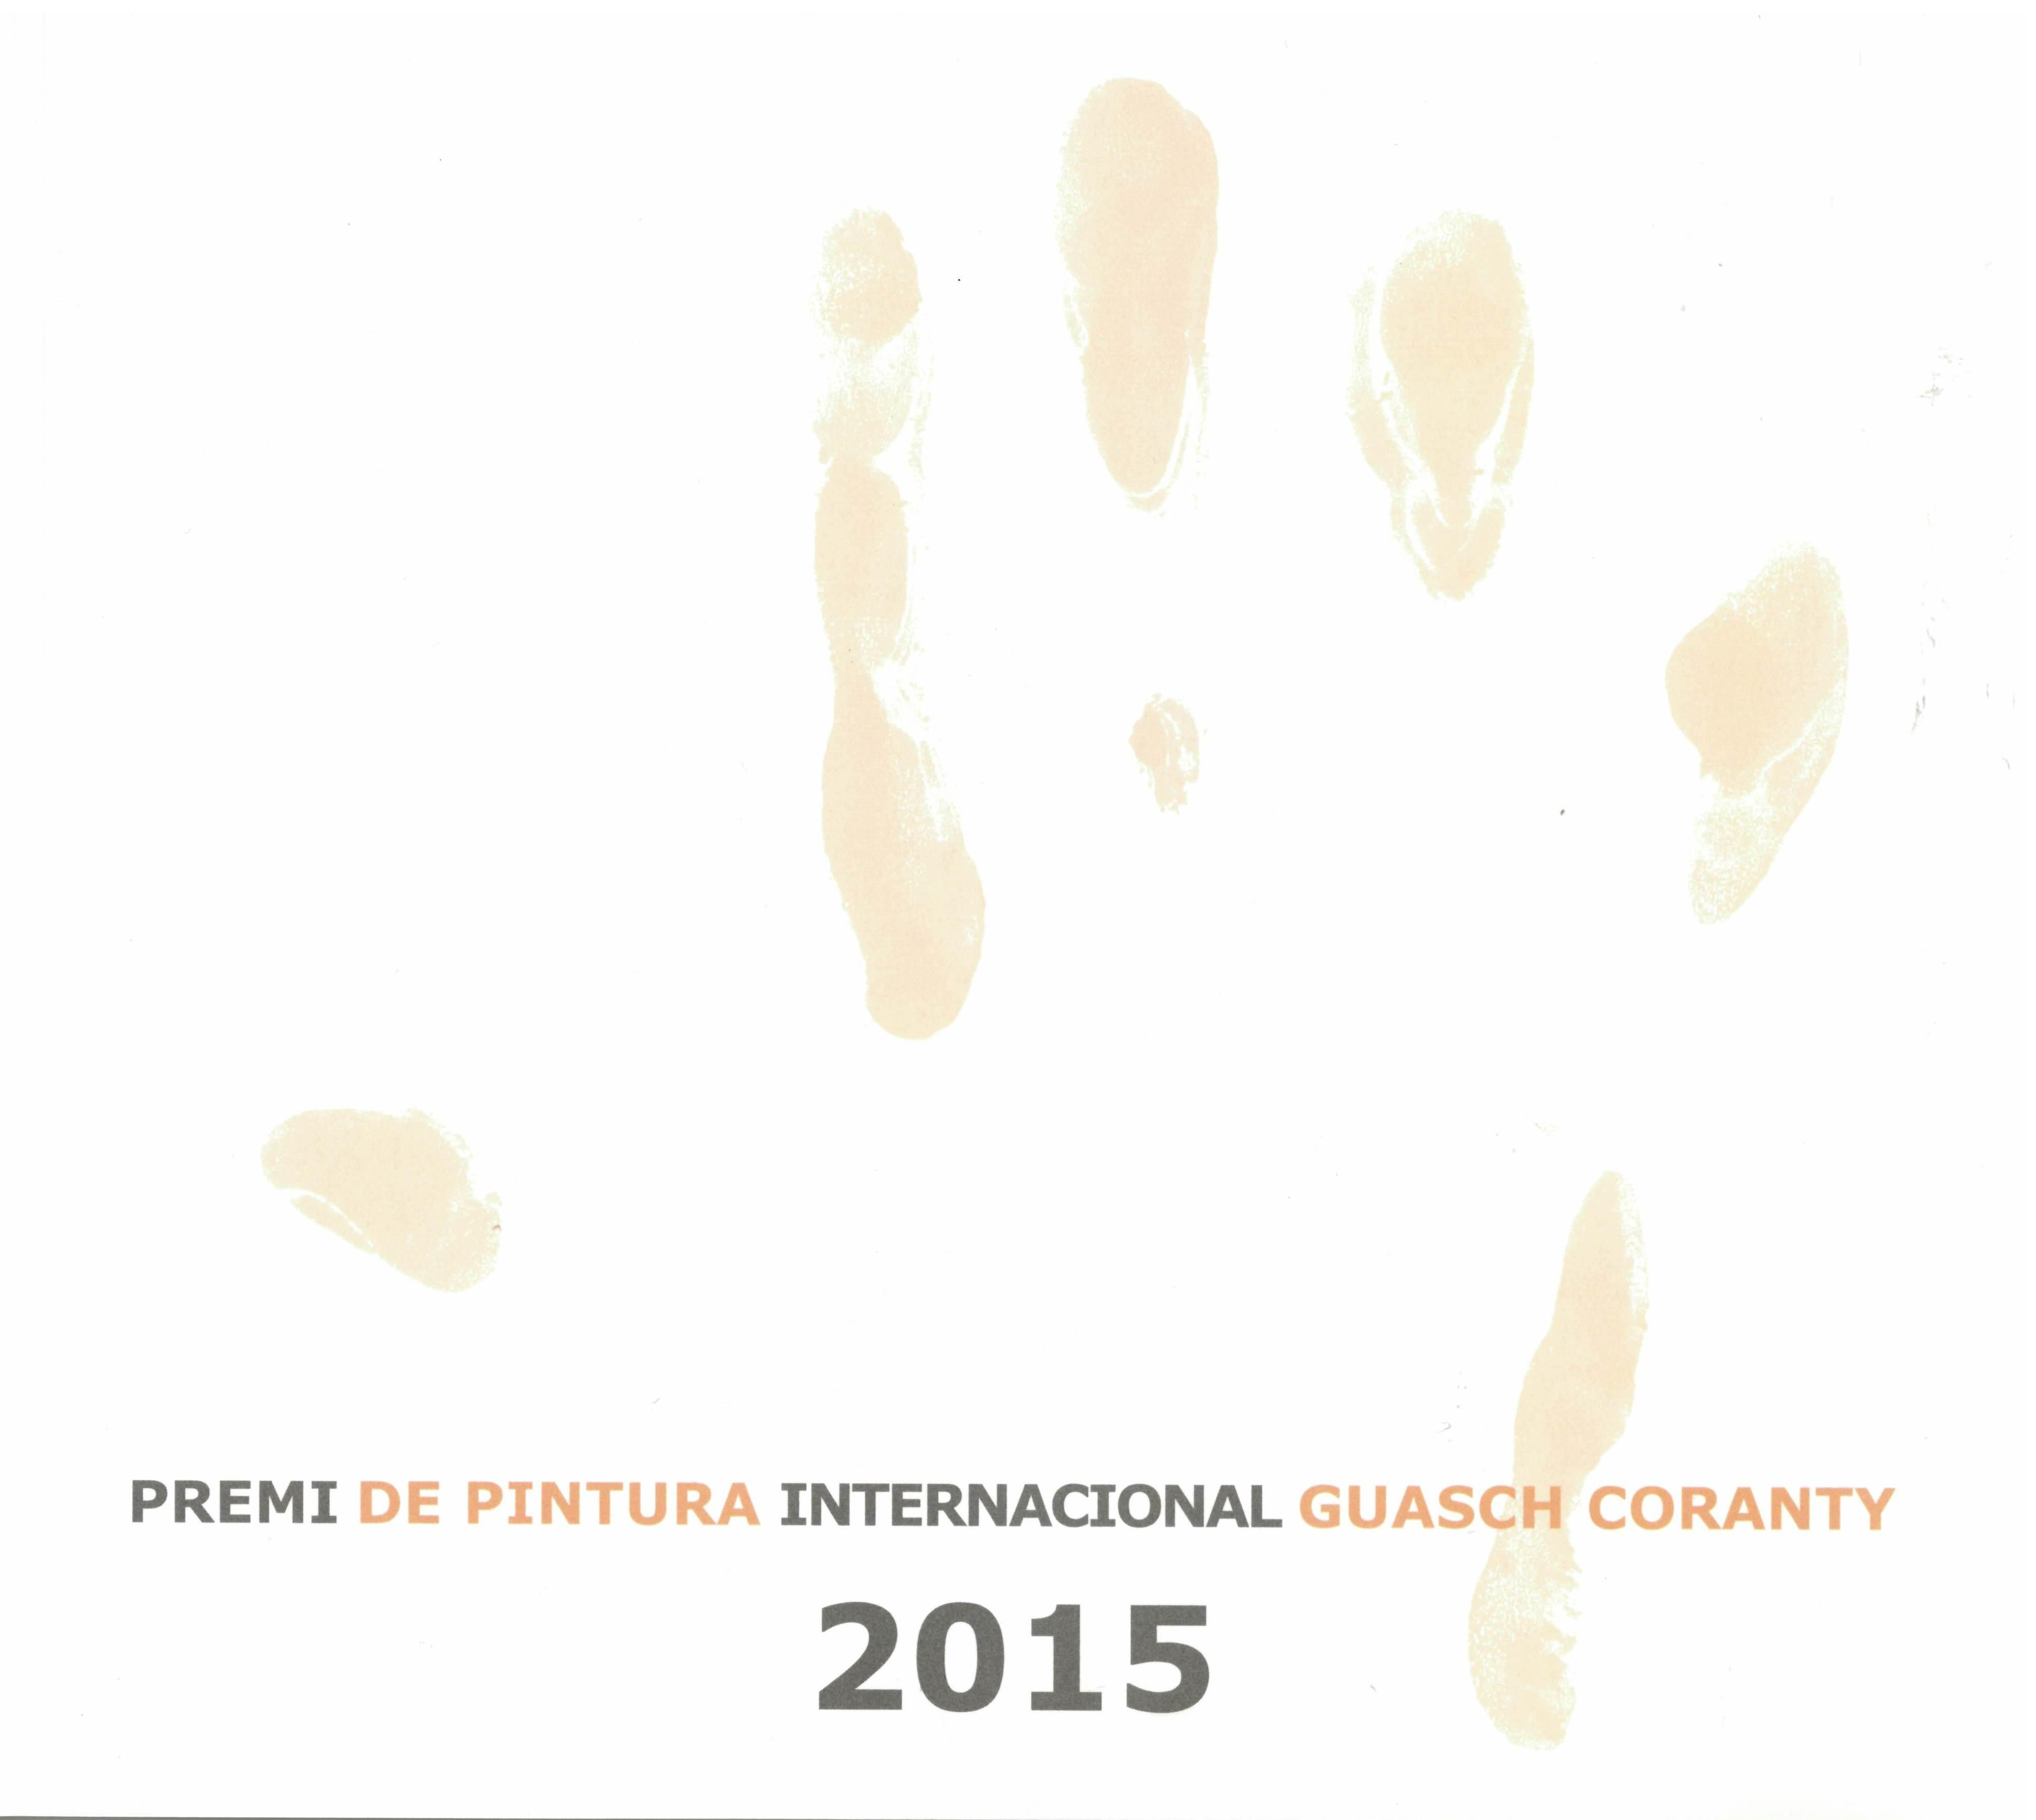 Premi de pintura intenacional Guasch Coranty 2015